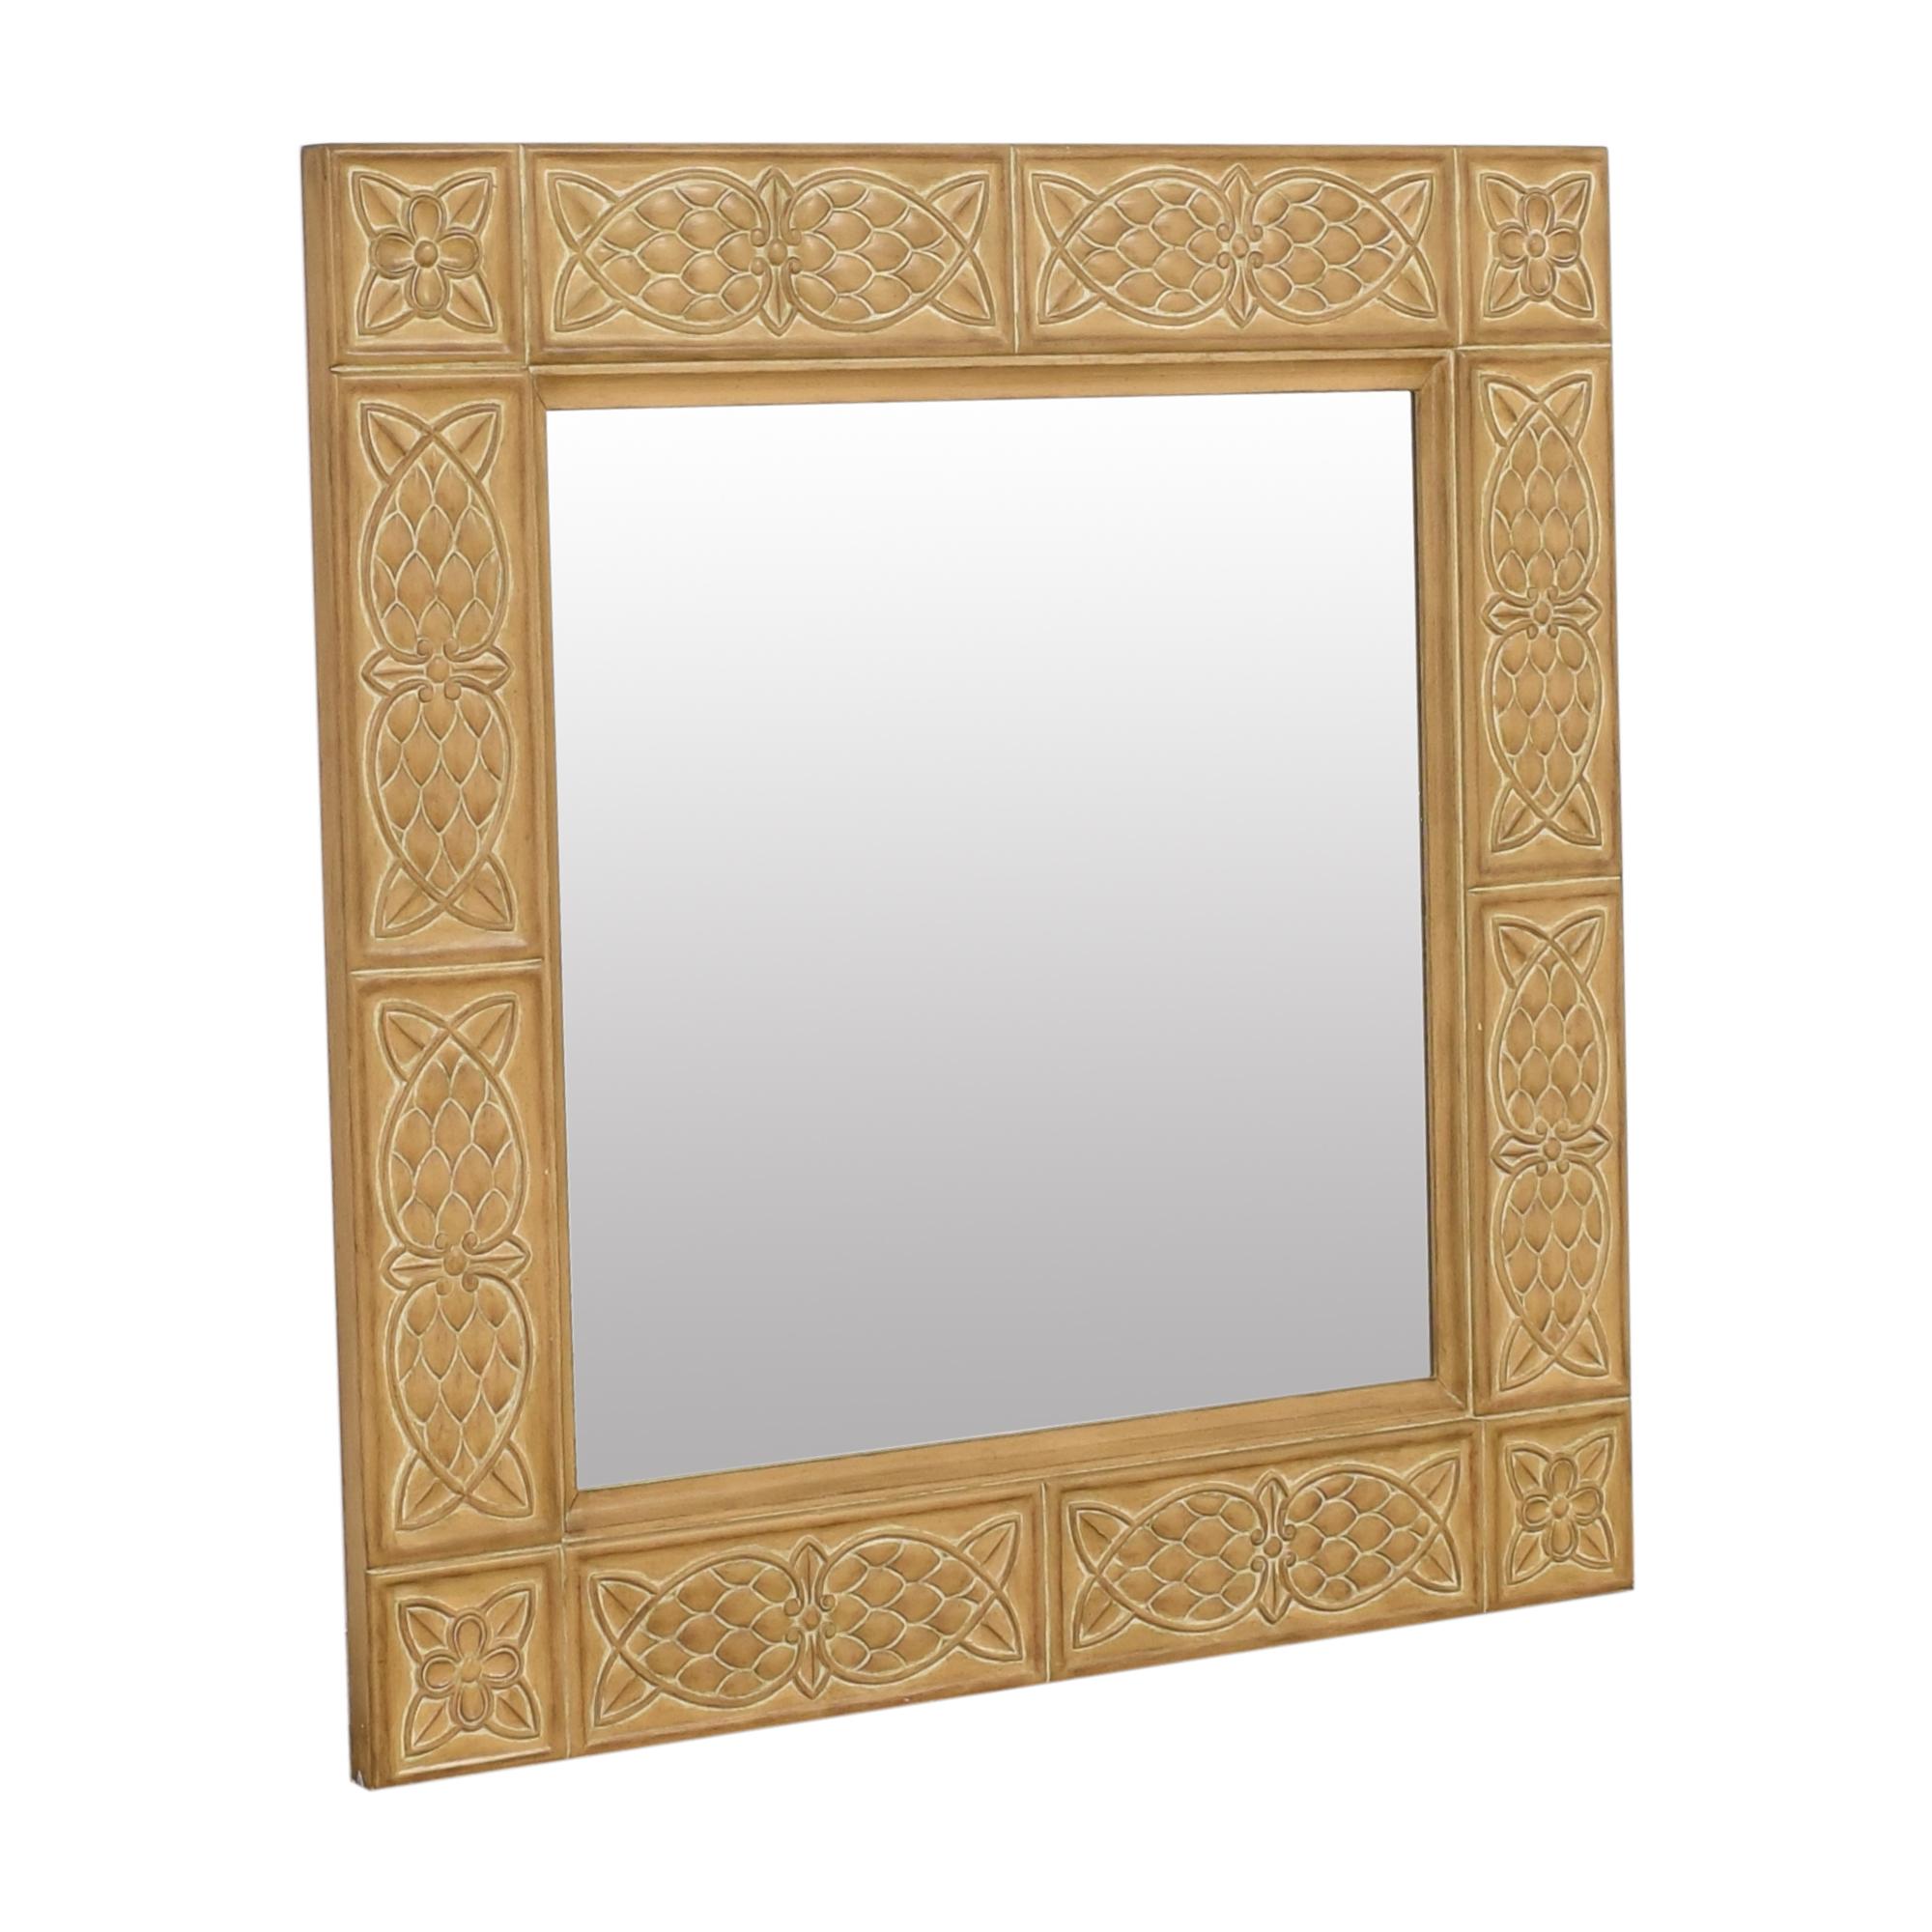 Lexington Furniture Lexington Decorative Framed Wall Mirror Mirrors